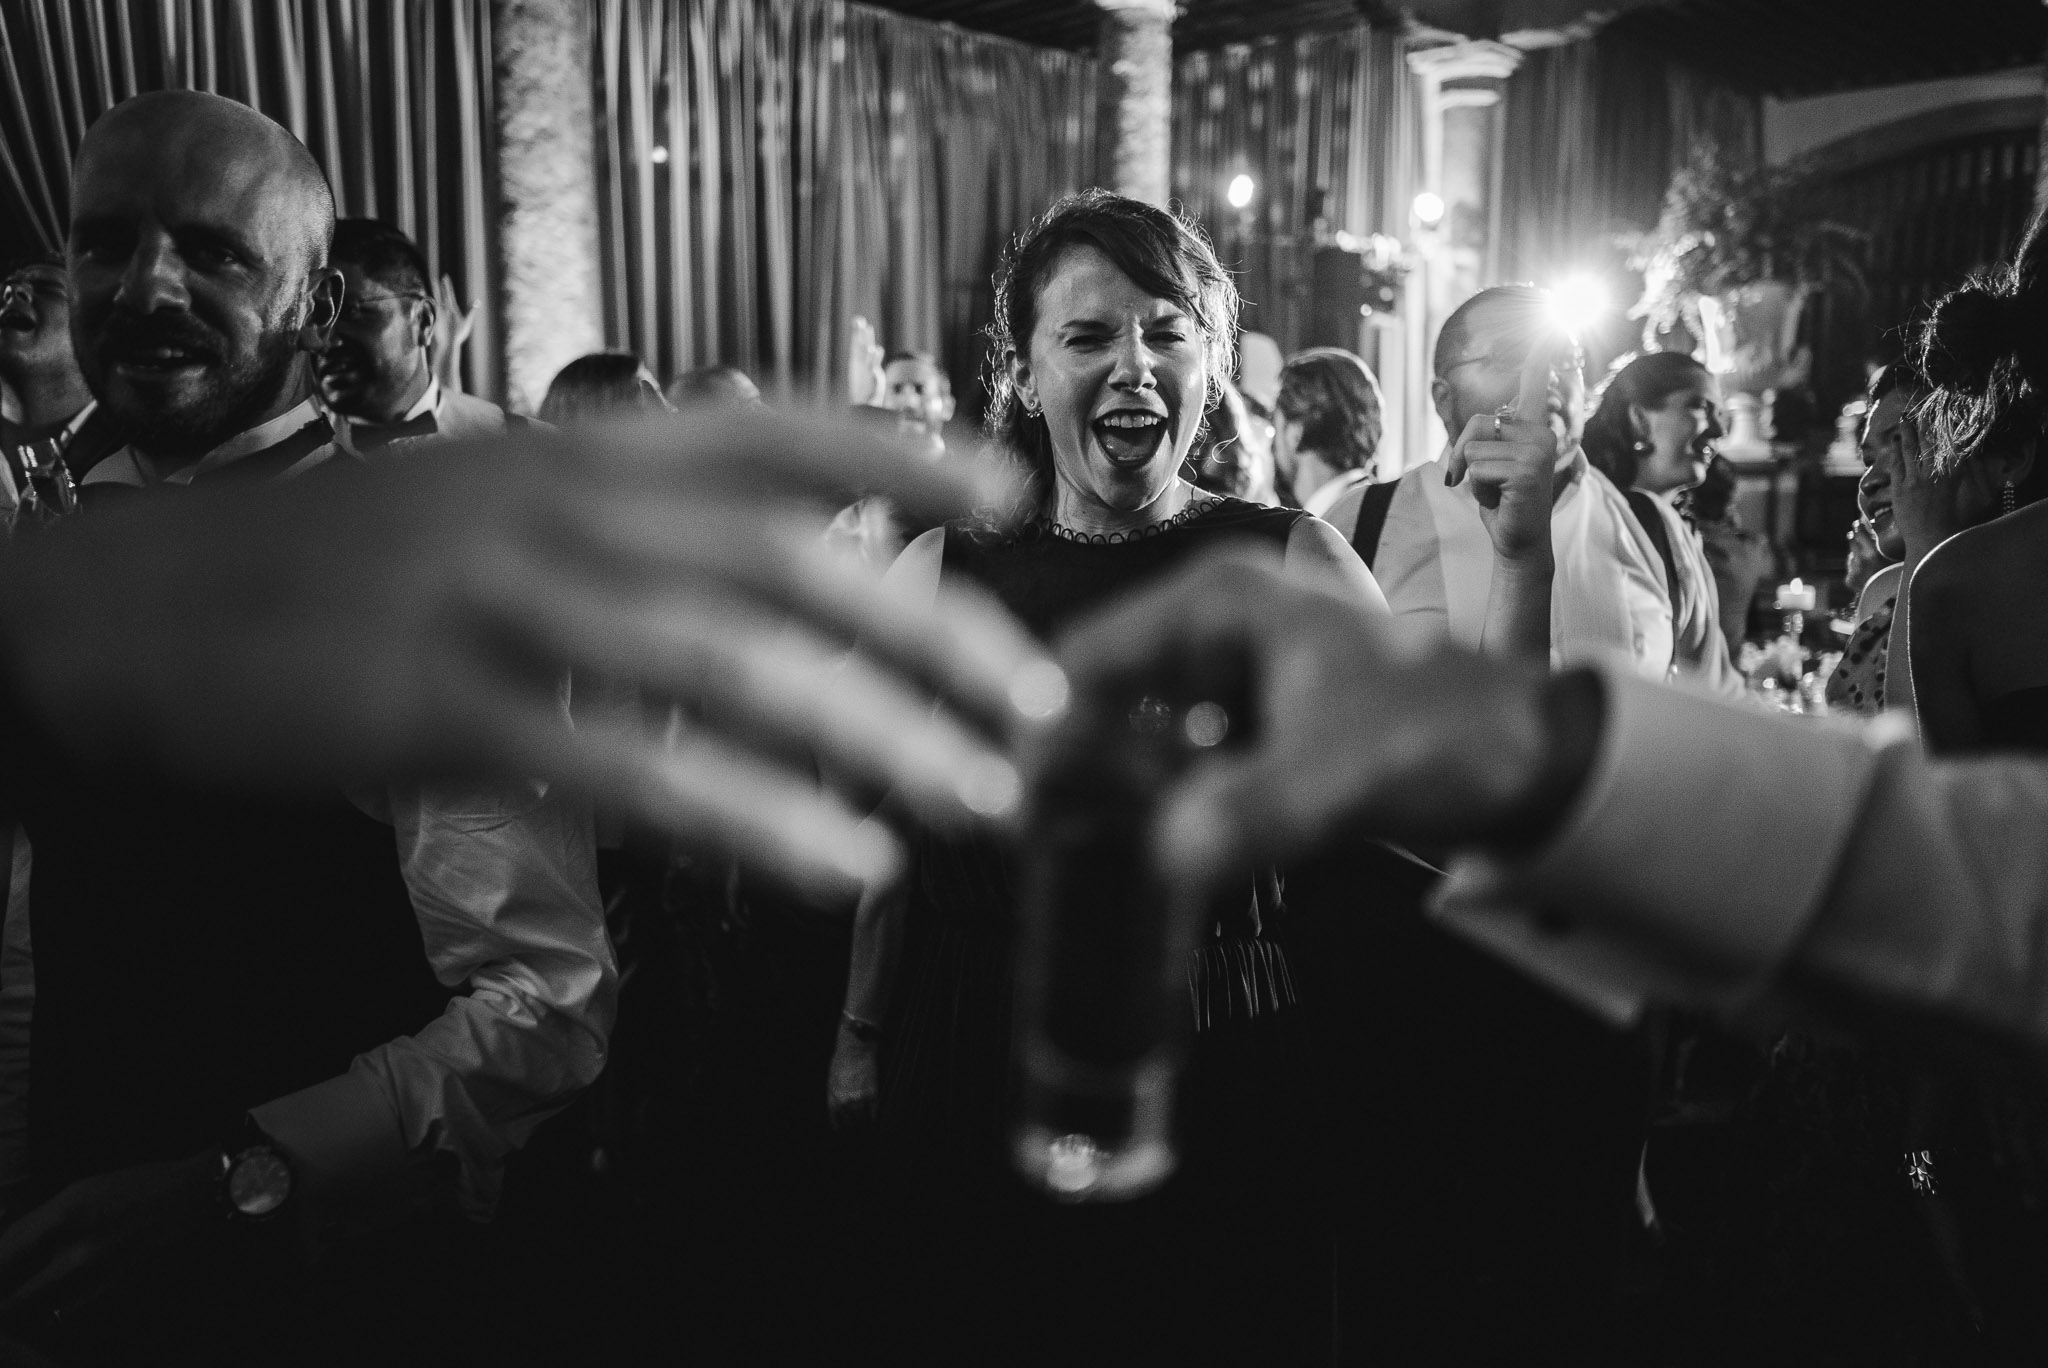 ©www.mauriziosolisbroca.com-20161002maurizio-solis-broca-mexico-canada-wedding-photographer20161002DSC09578-Edit.jpg